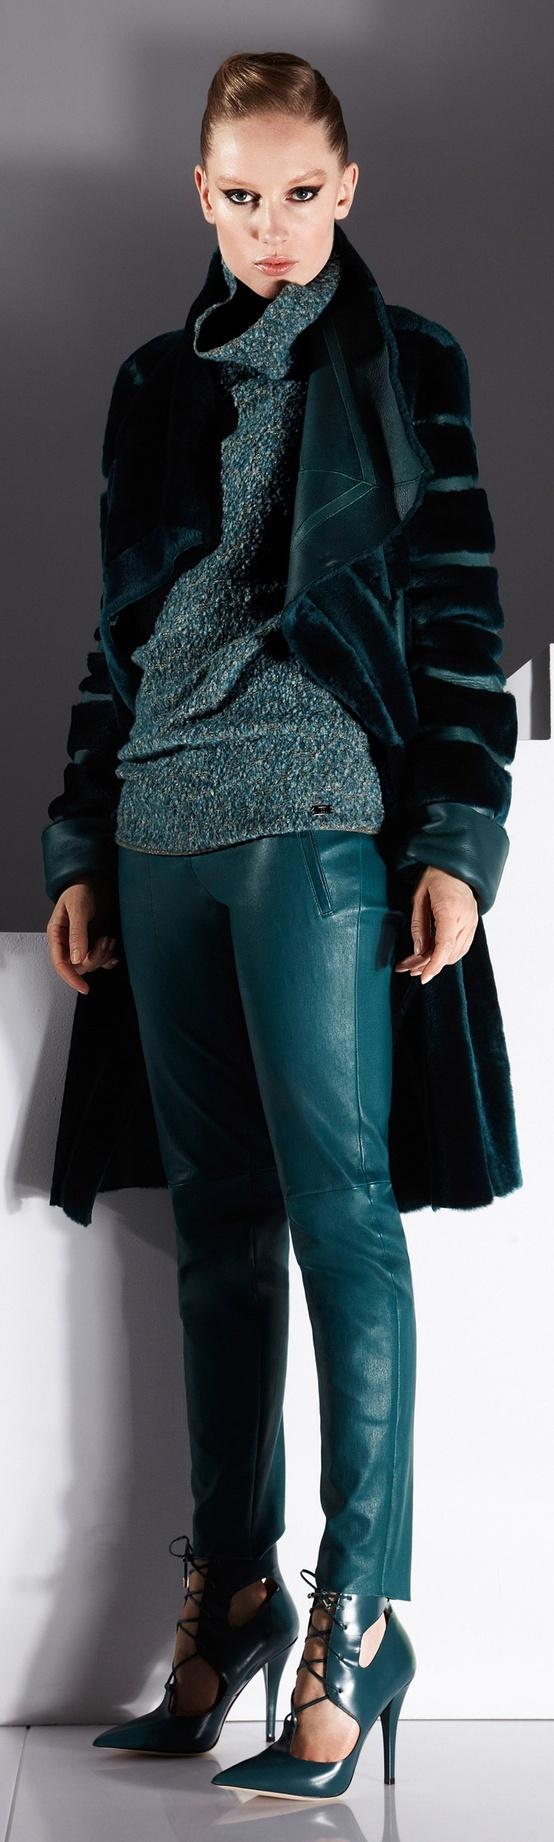 Teal green Escada coat, sweater, pants, stilettos